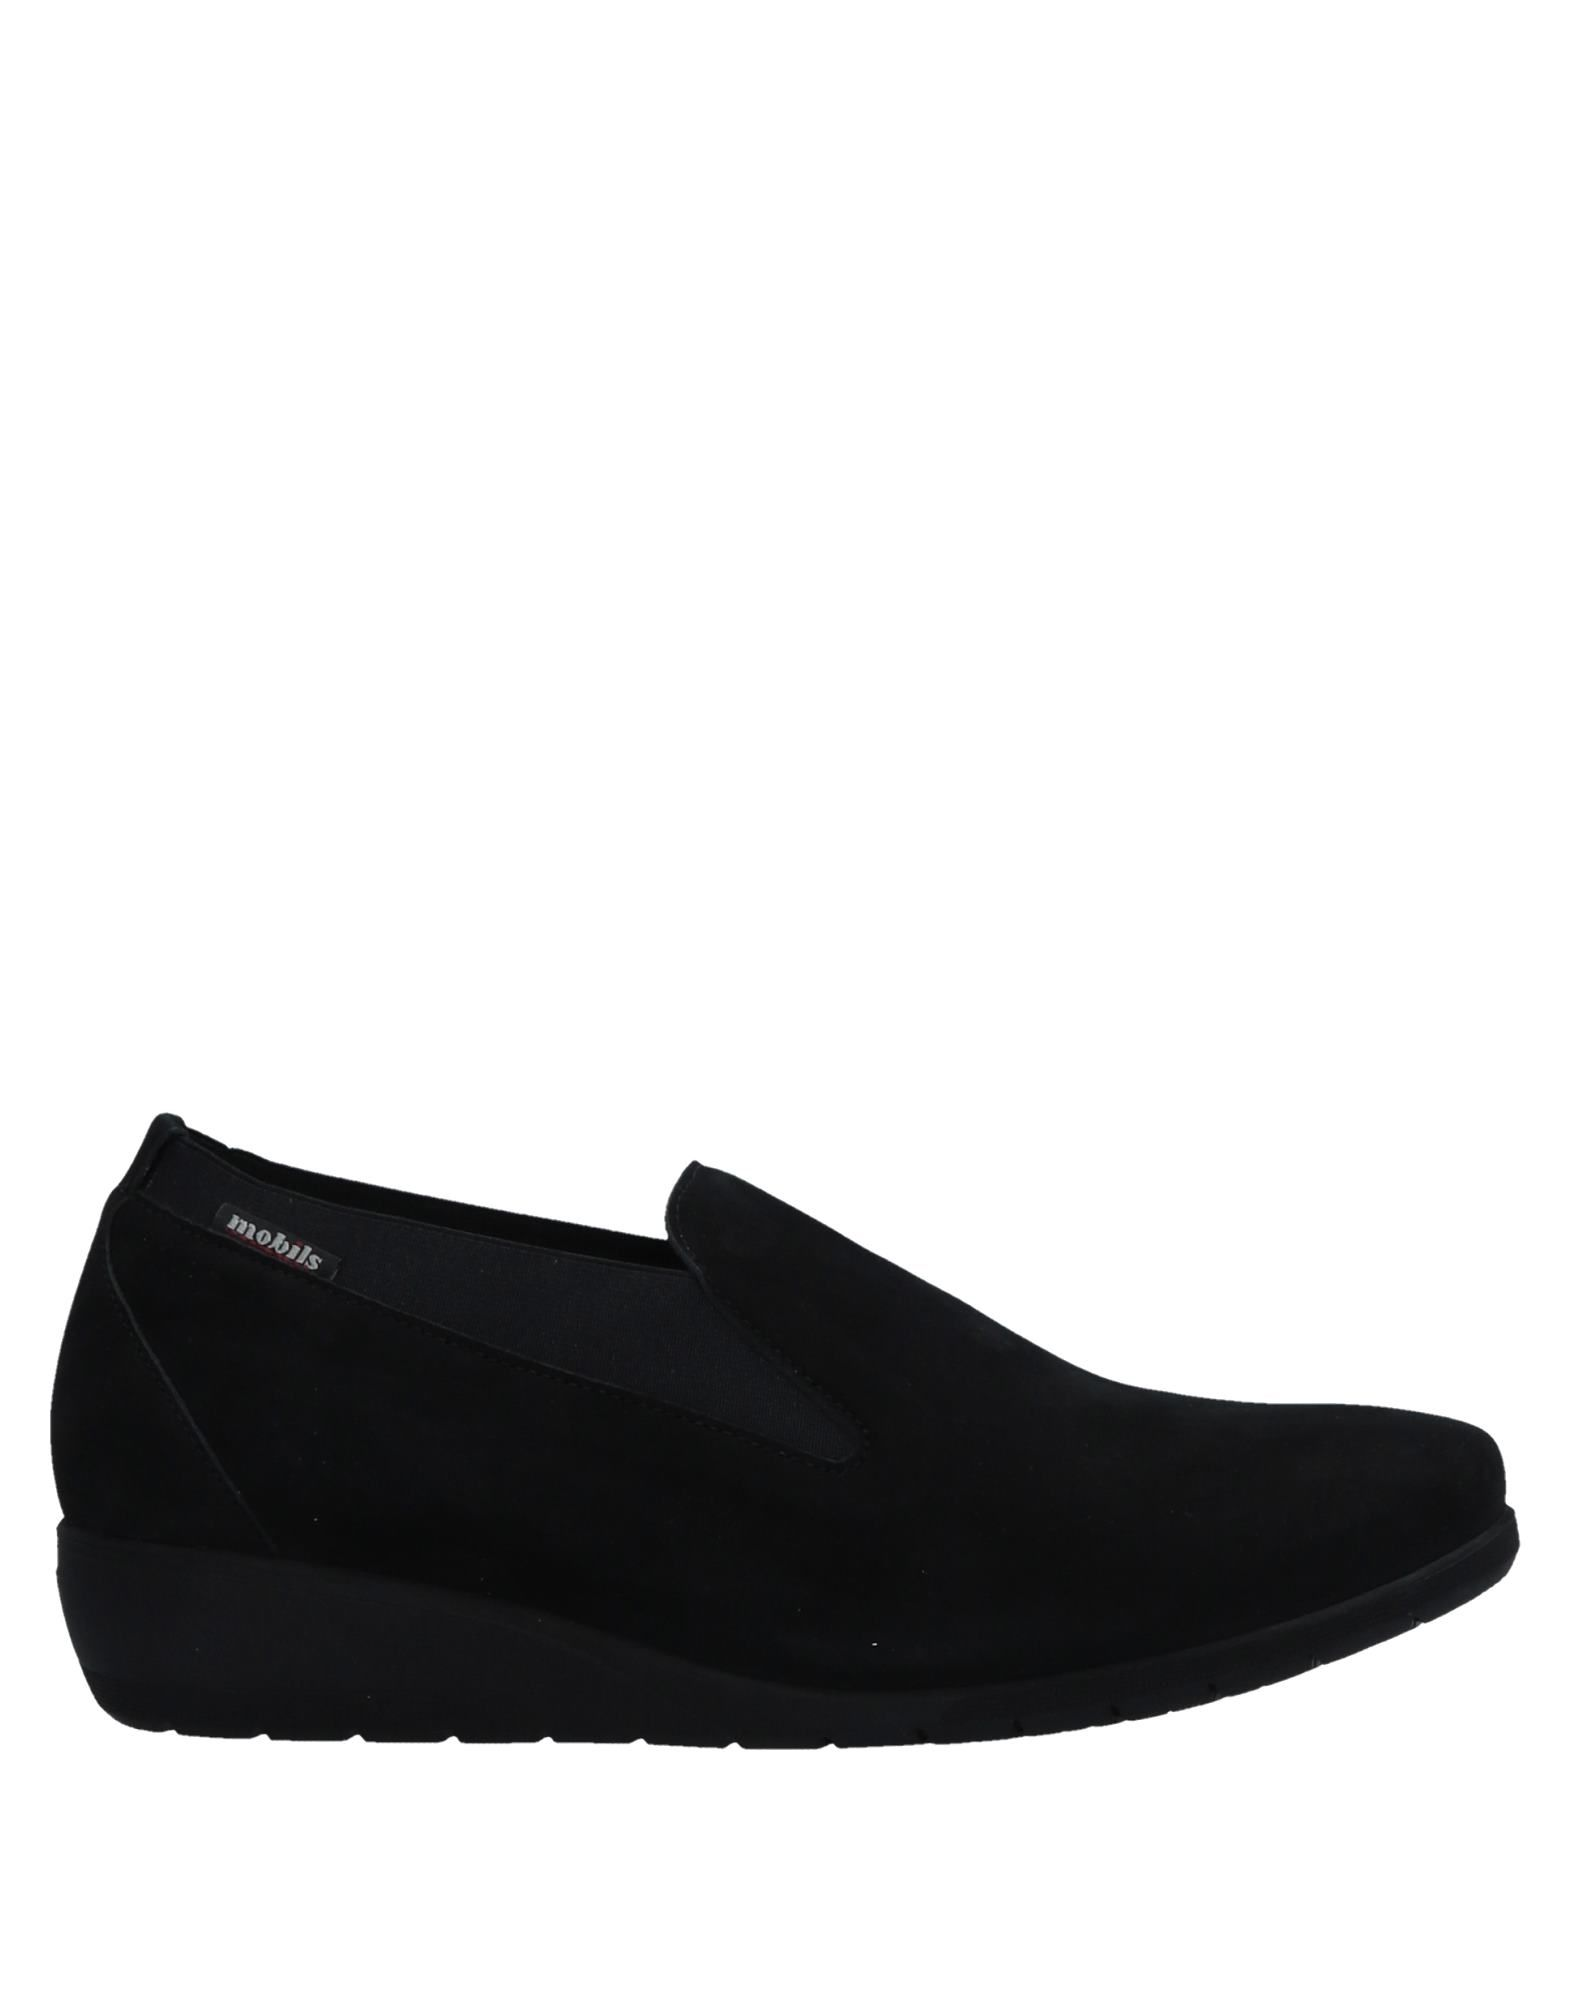 Mephisto Mokassins Qualität Damen  11516220DR Gute Qualität Mokassins beliebte Schuhe bd4714